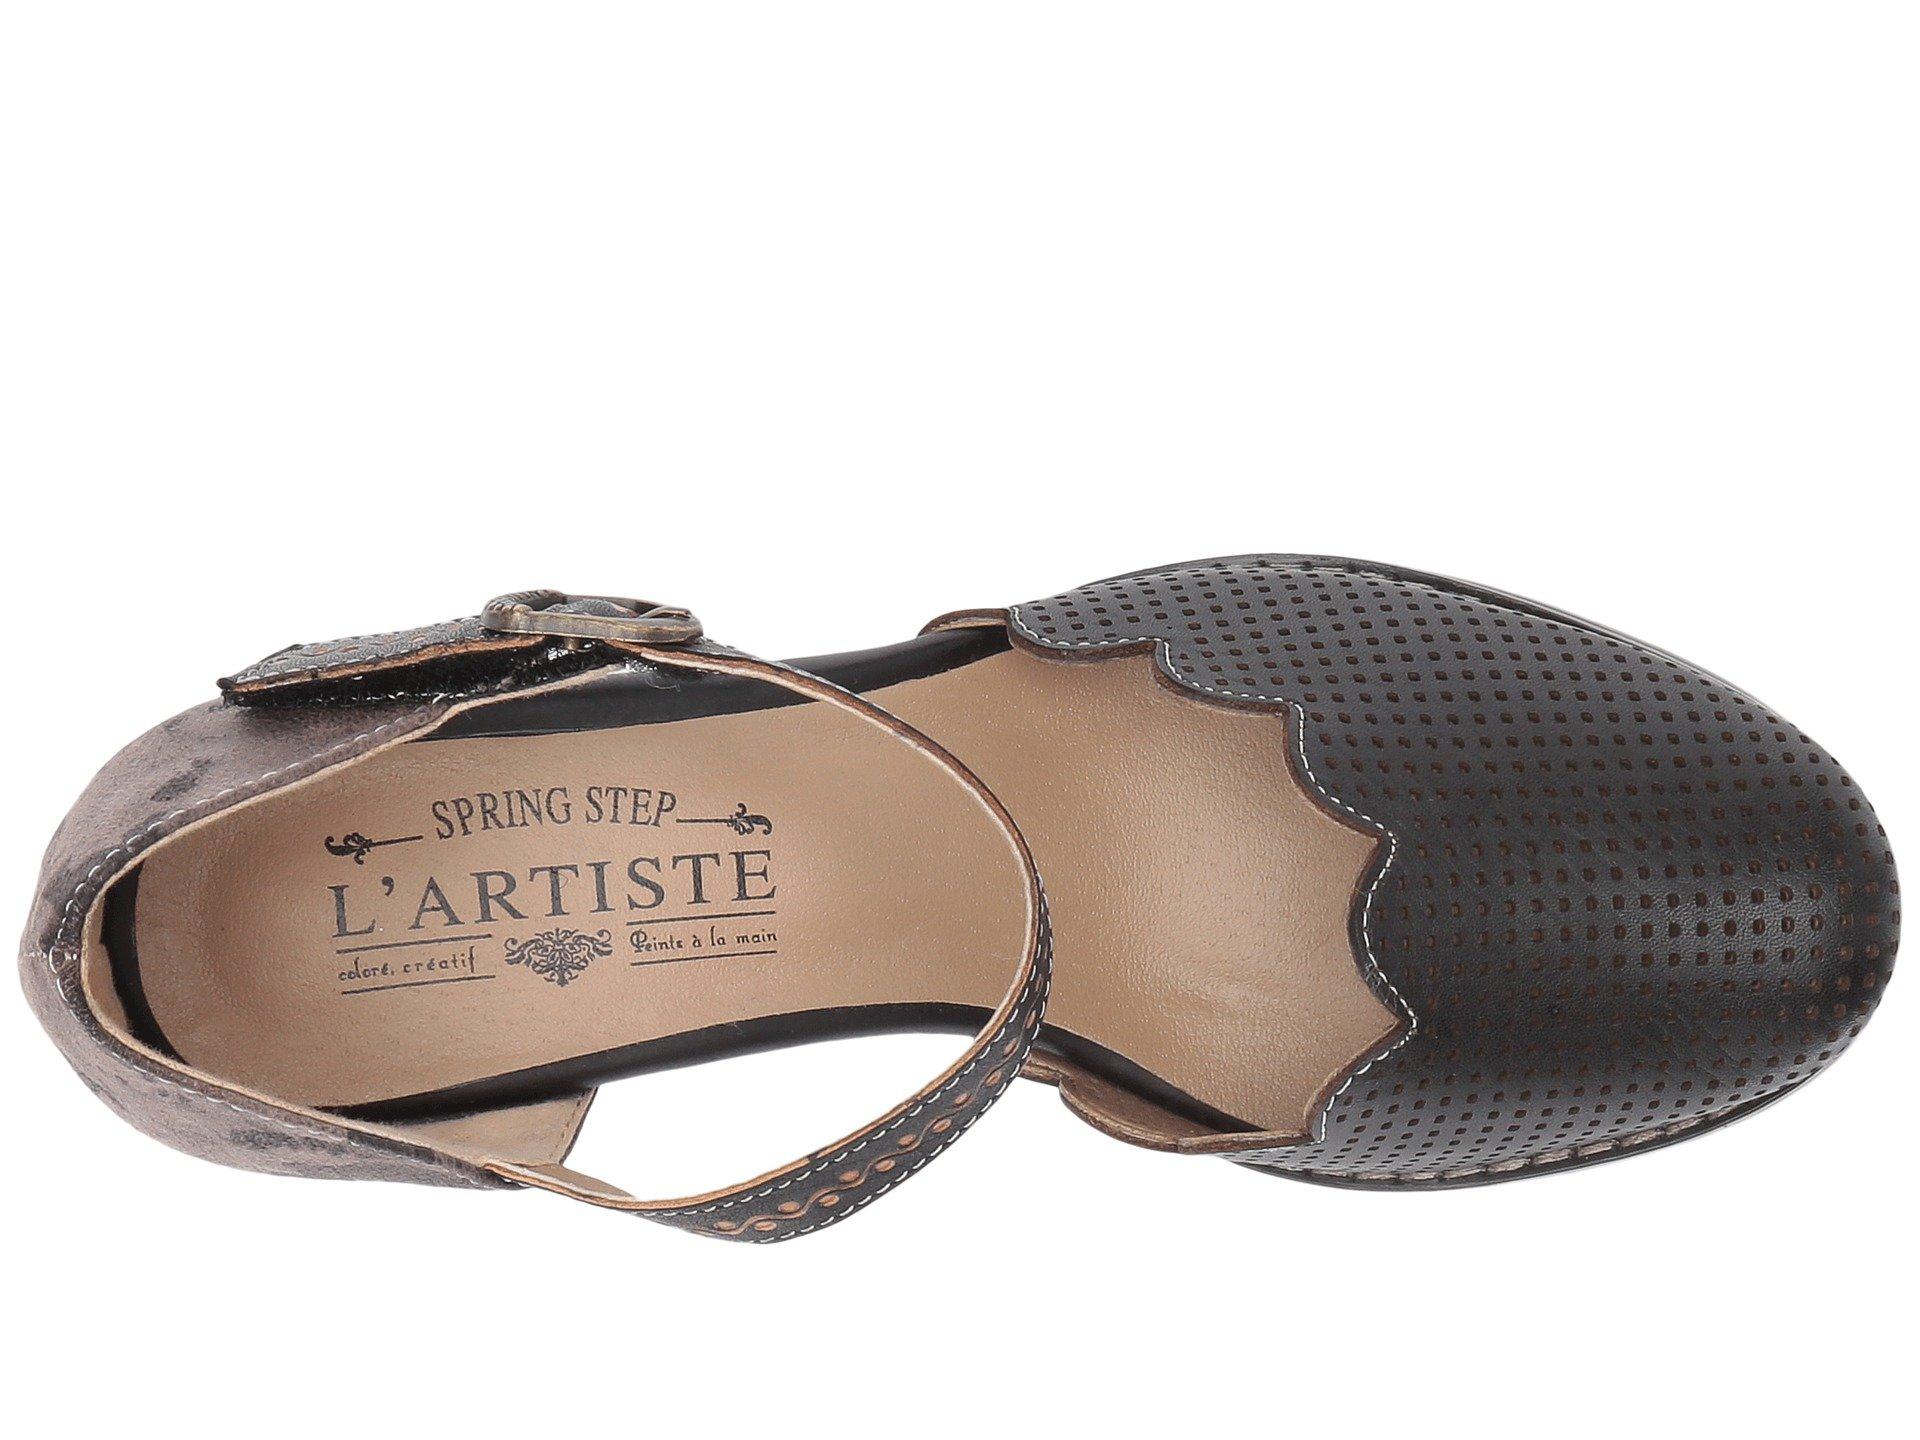 lartiste spring step parchelle zapposcom